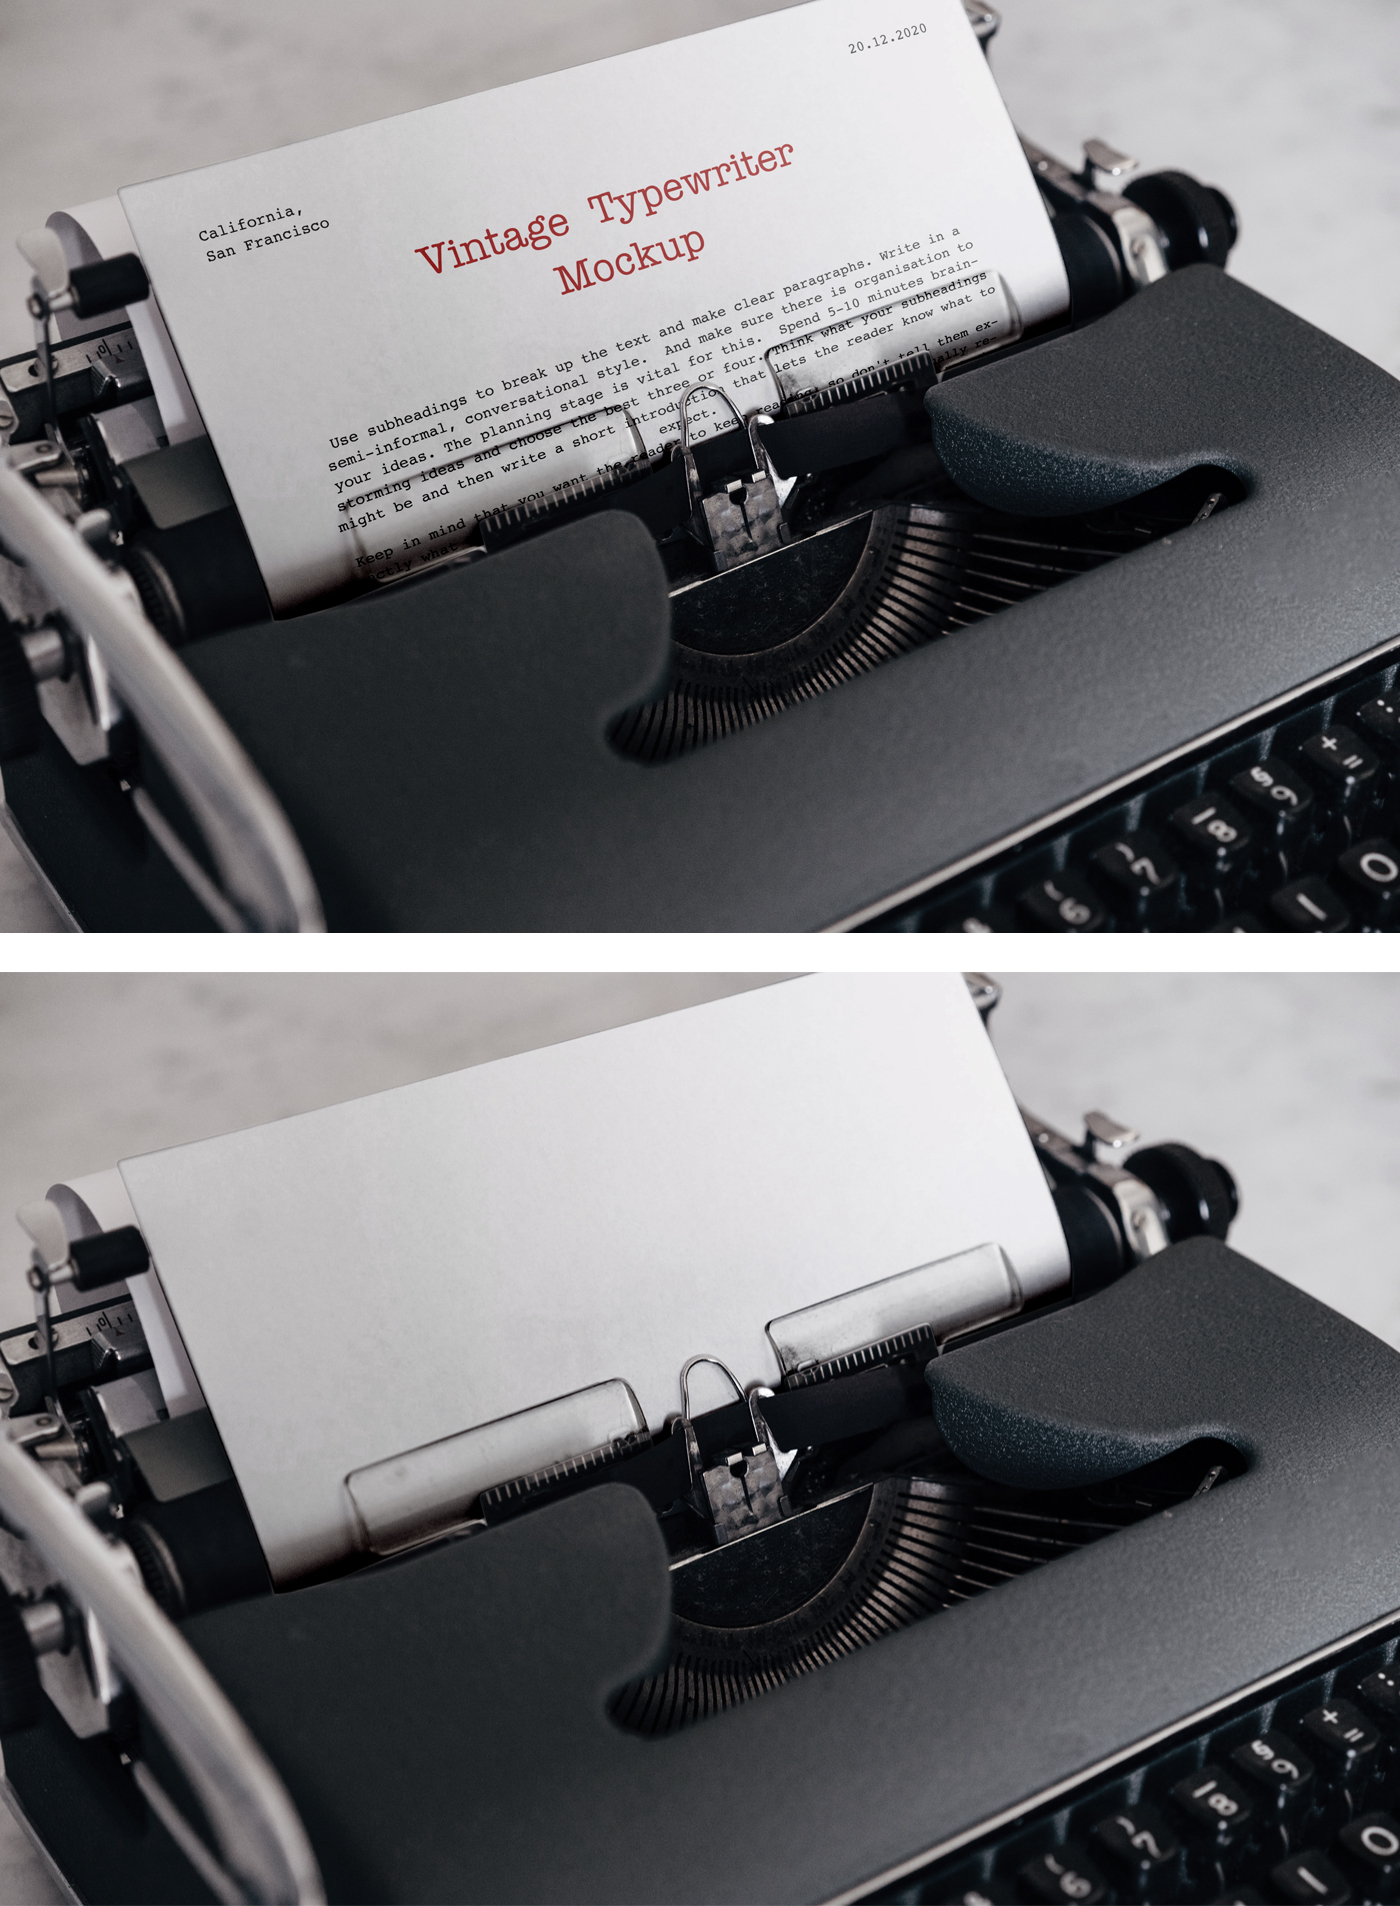 Vintage Typewriter Mockup